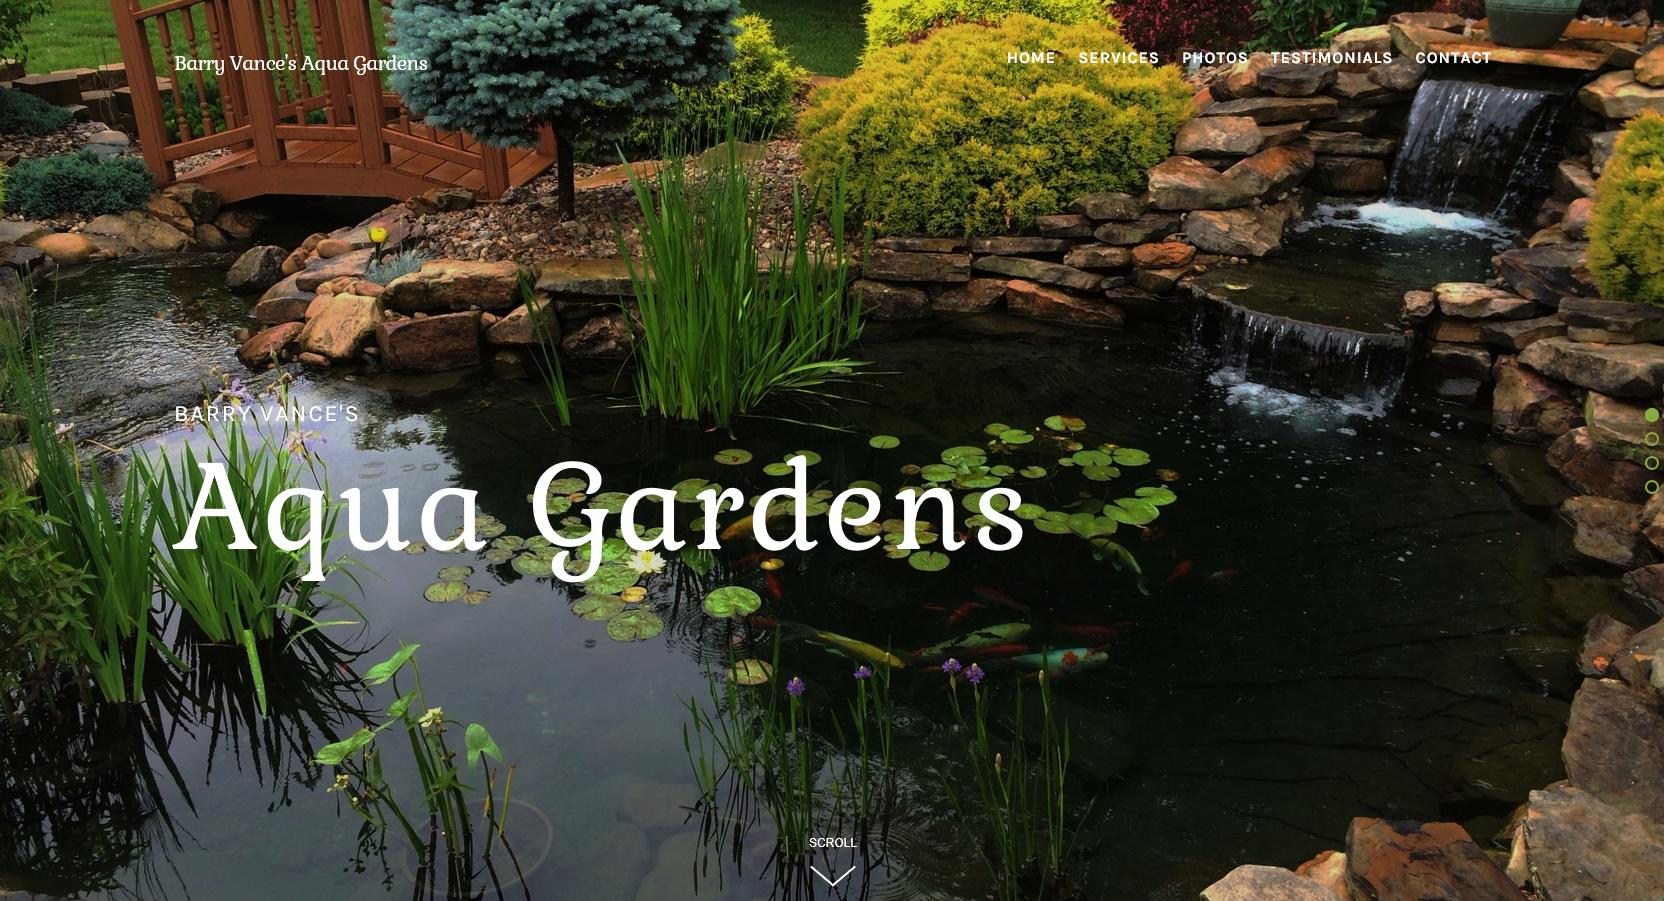 Barry Vance's Aqua Gardens